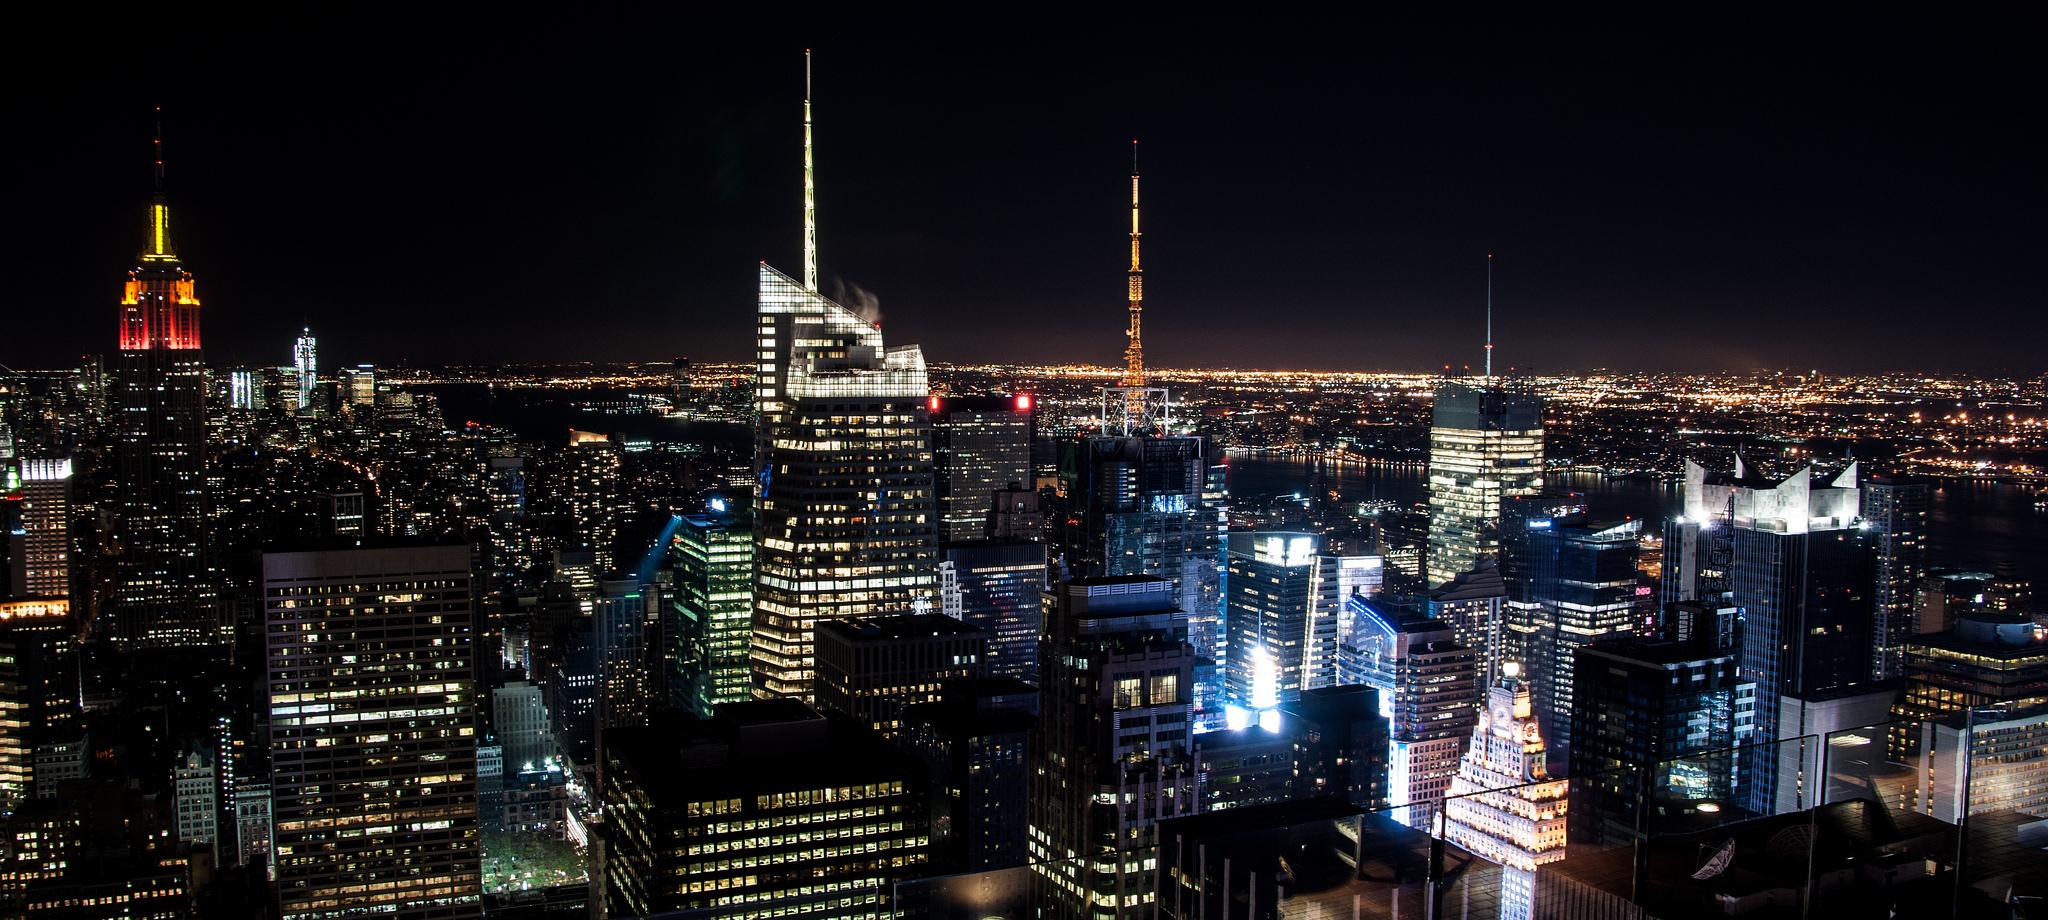 NYC night view by Iván Lara vía Flickr